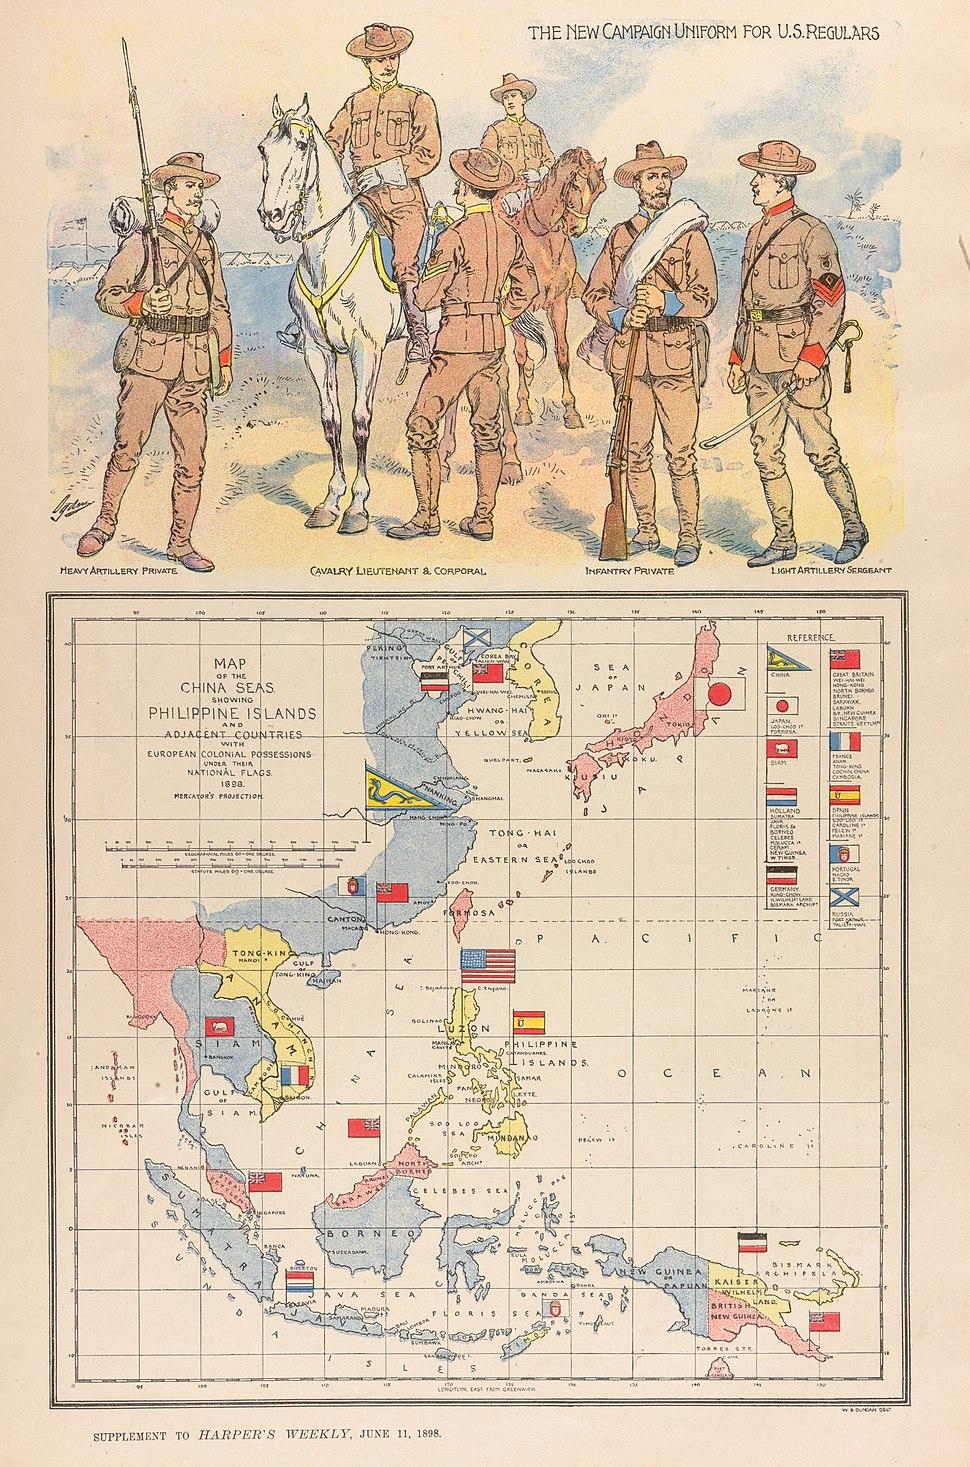 W. B. Duncan Map of the China Seas 1898 Cornell CUL PJM 1131 01